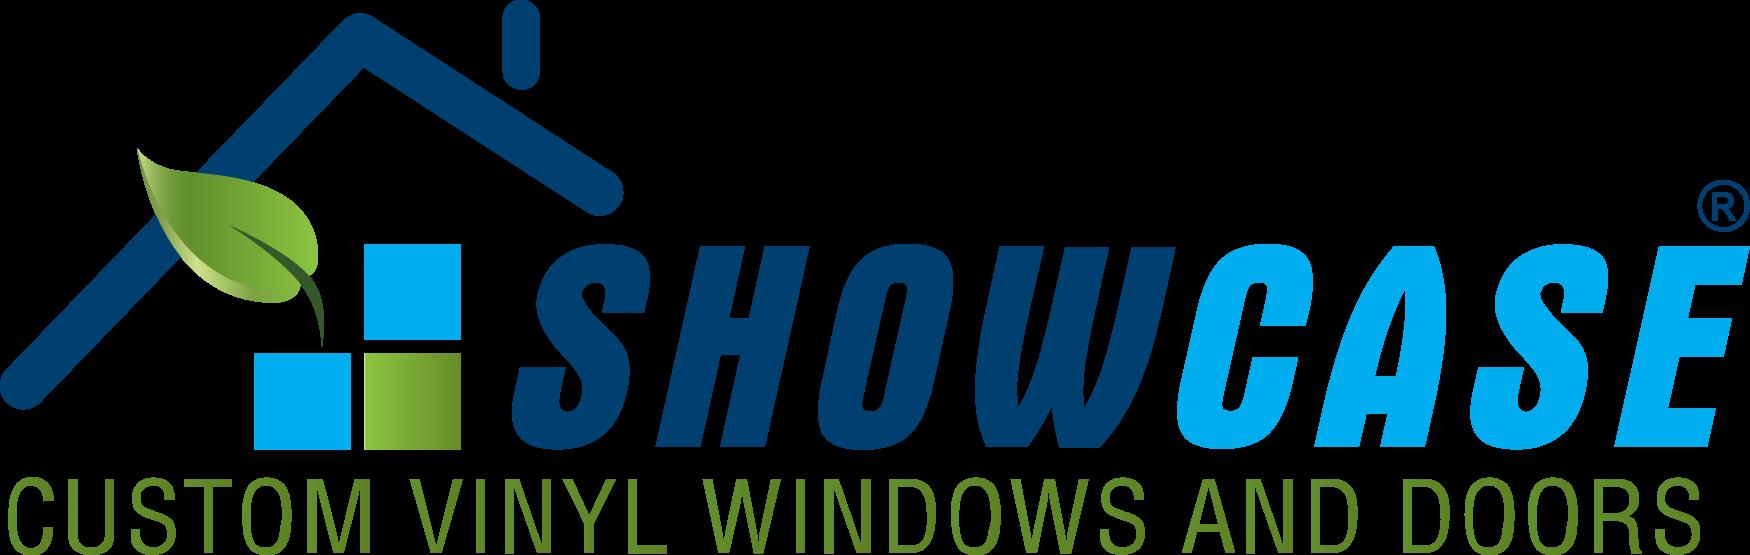 showcase-logo.png